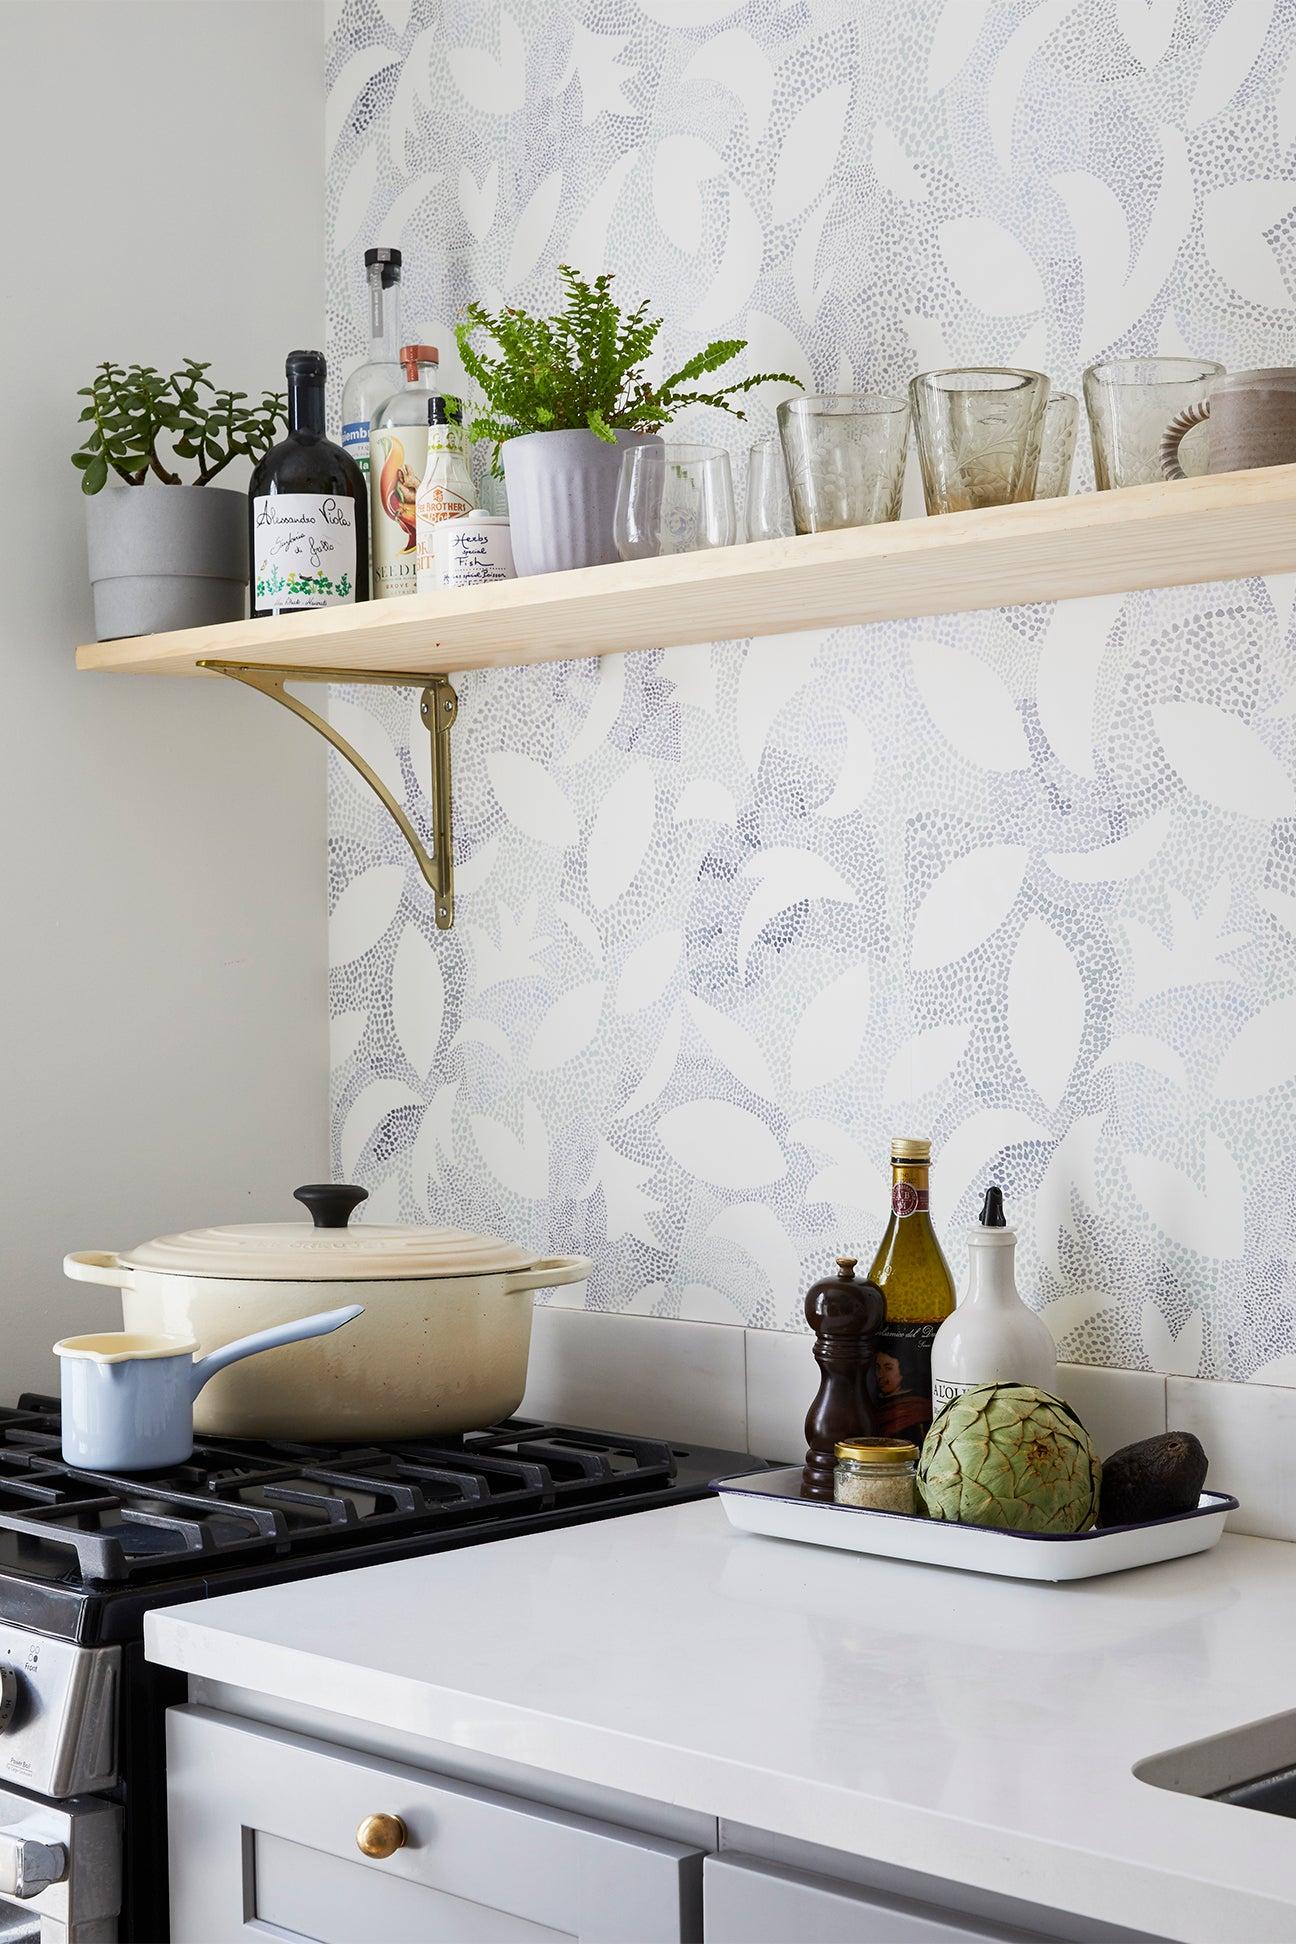 white pot on the stove